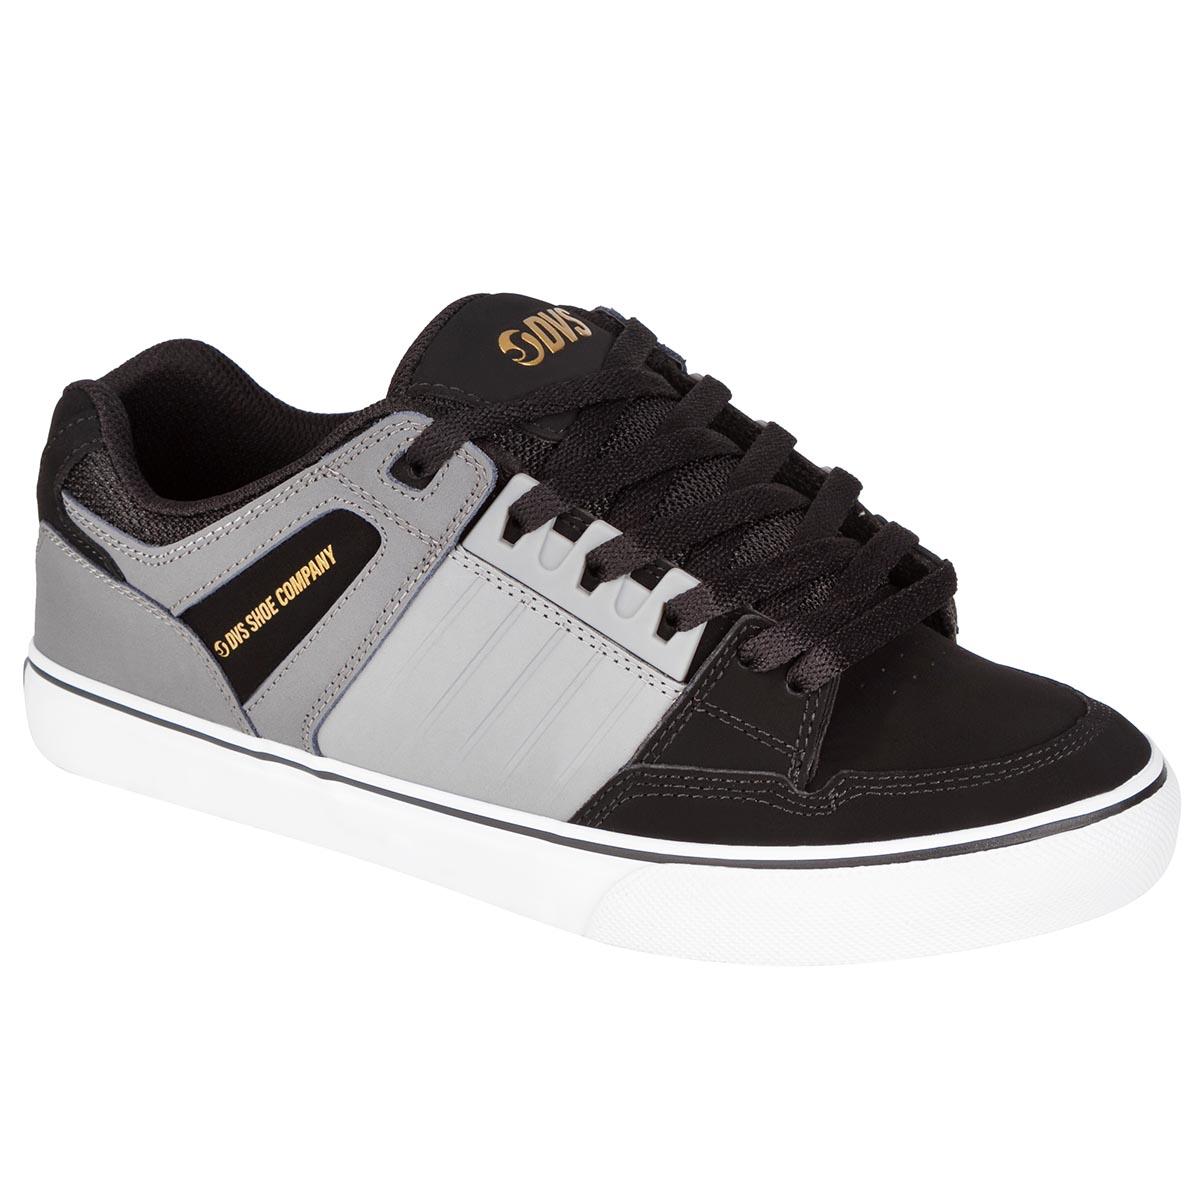 DVS Schuhe Celsius CT Charcoal Grey Black Nubuck